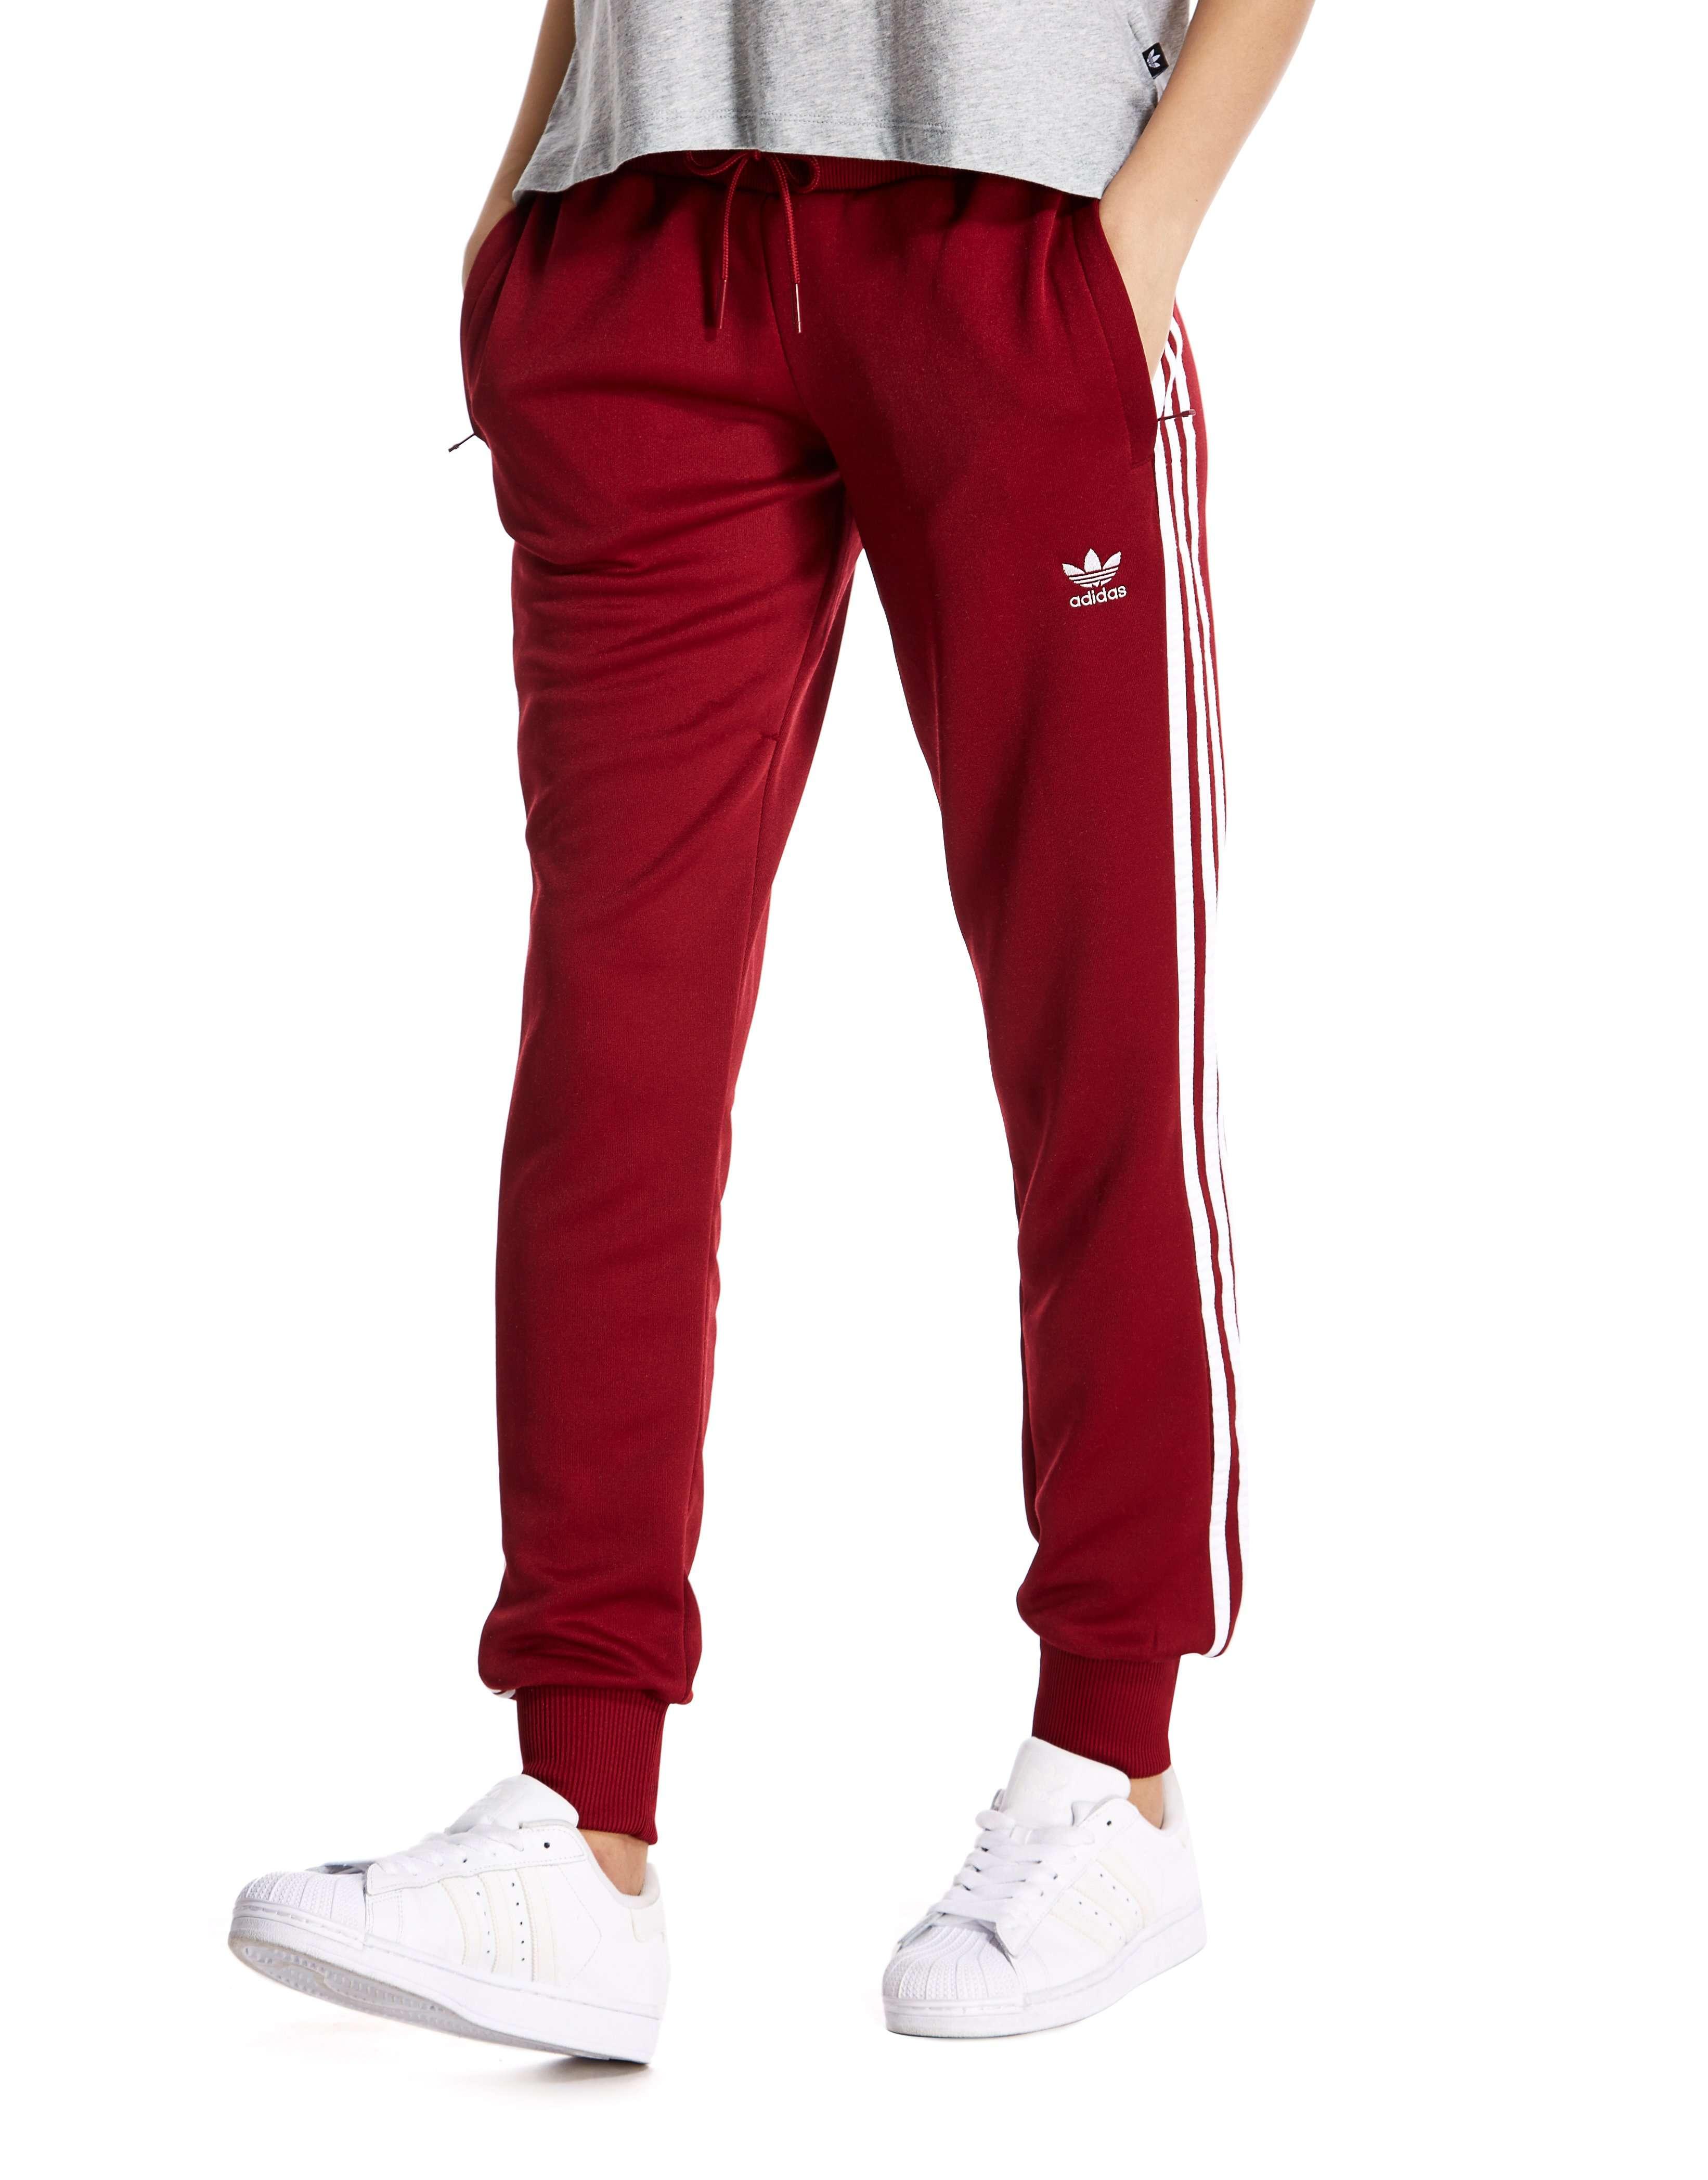 adidas Originals Girly Poly Track Pants